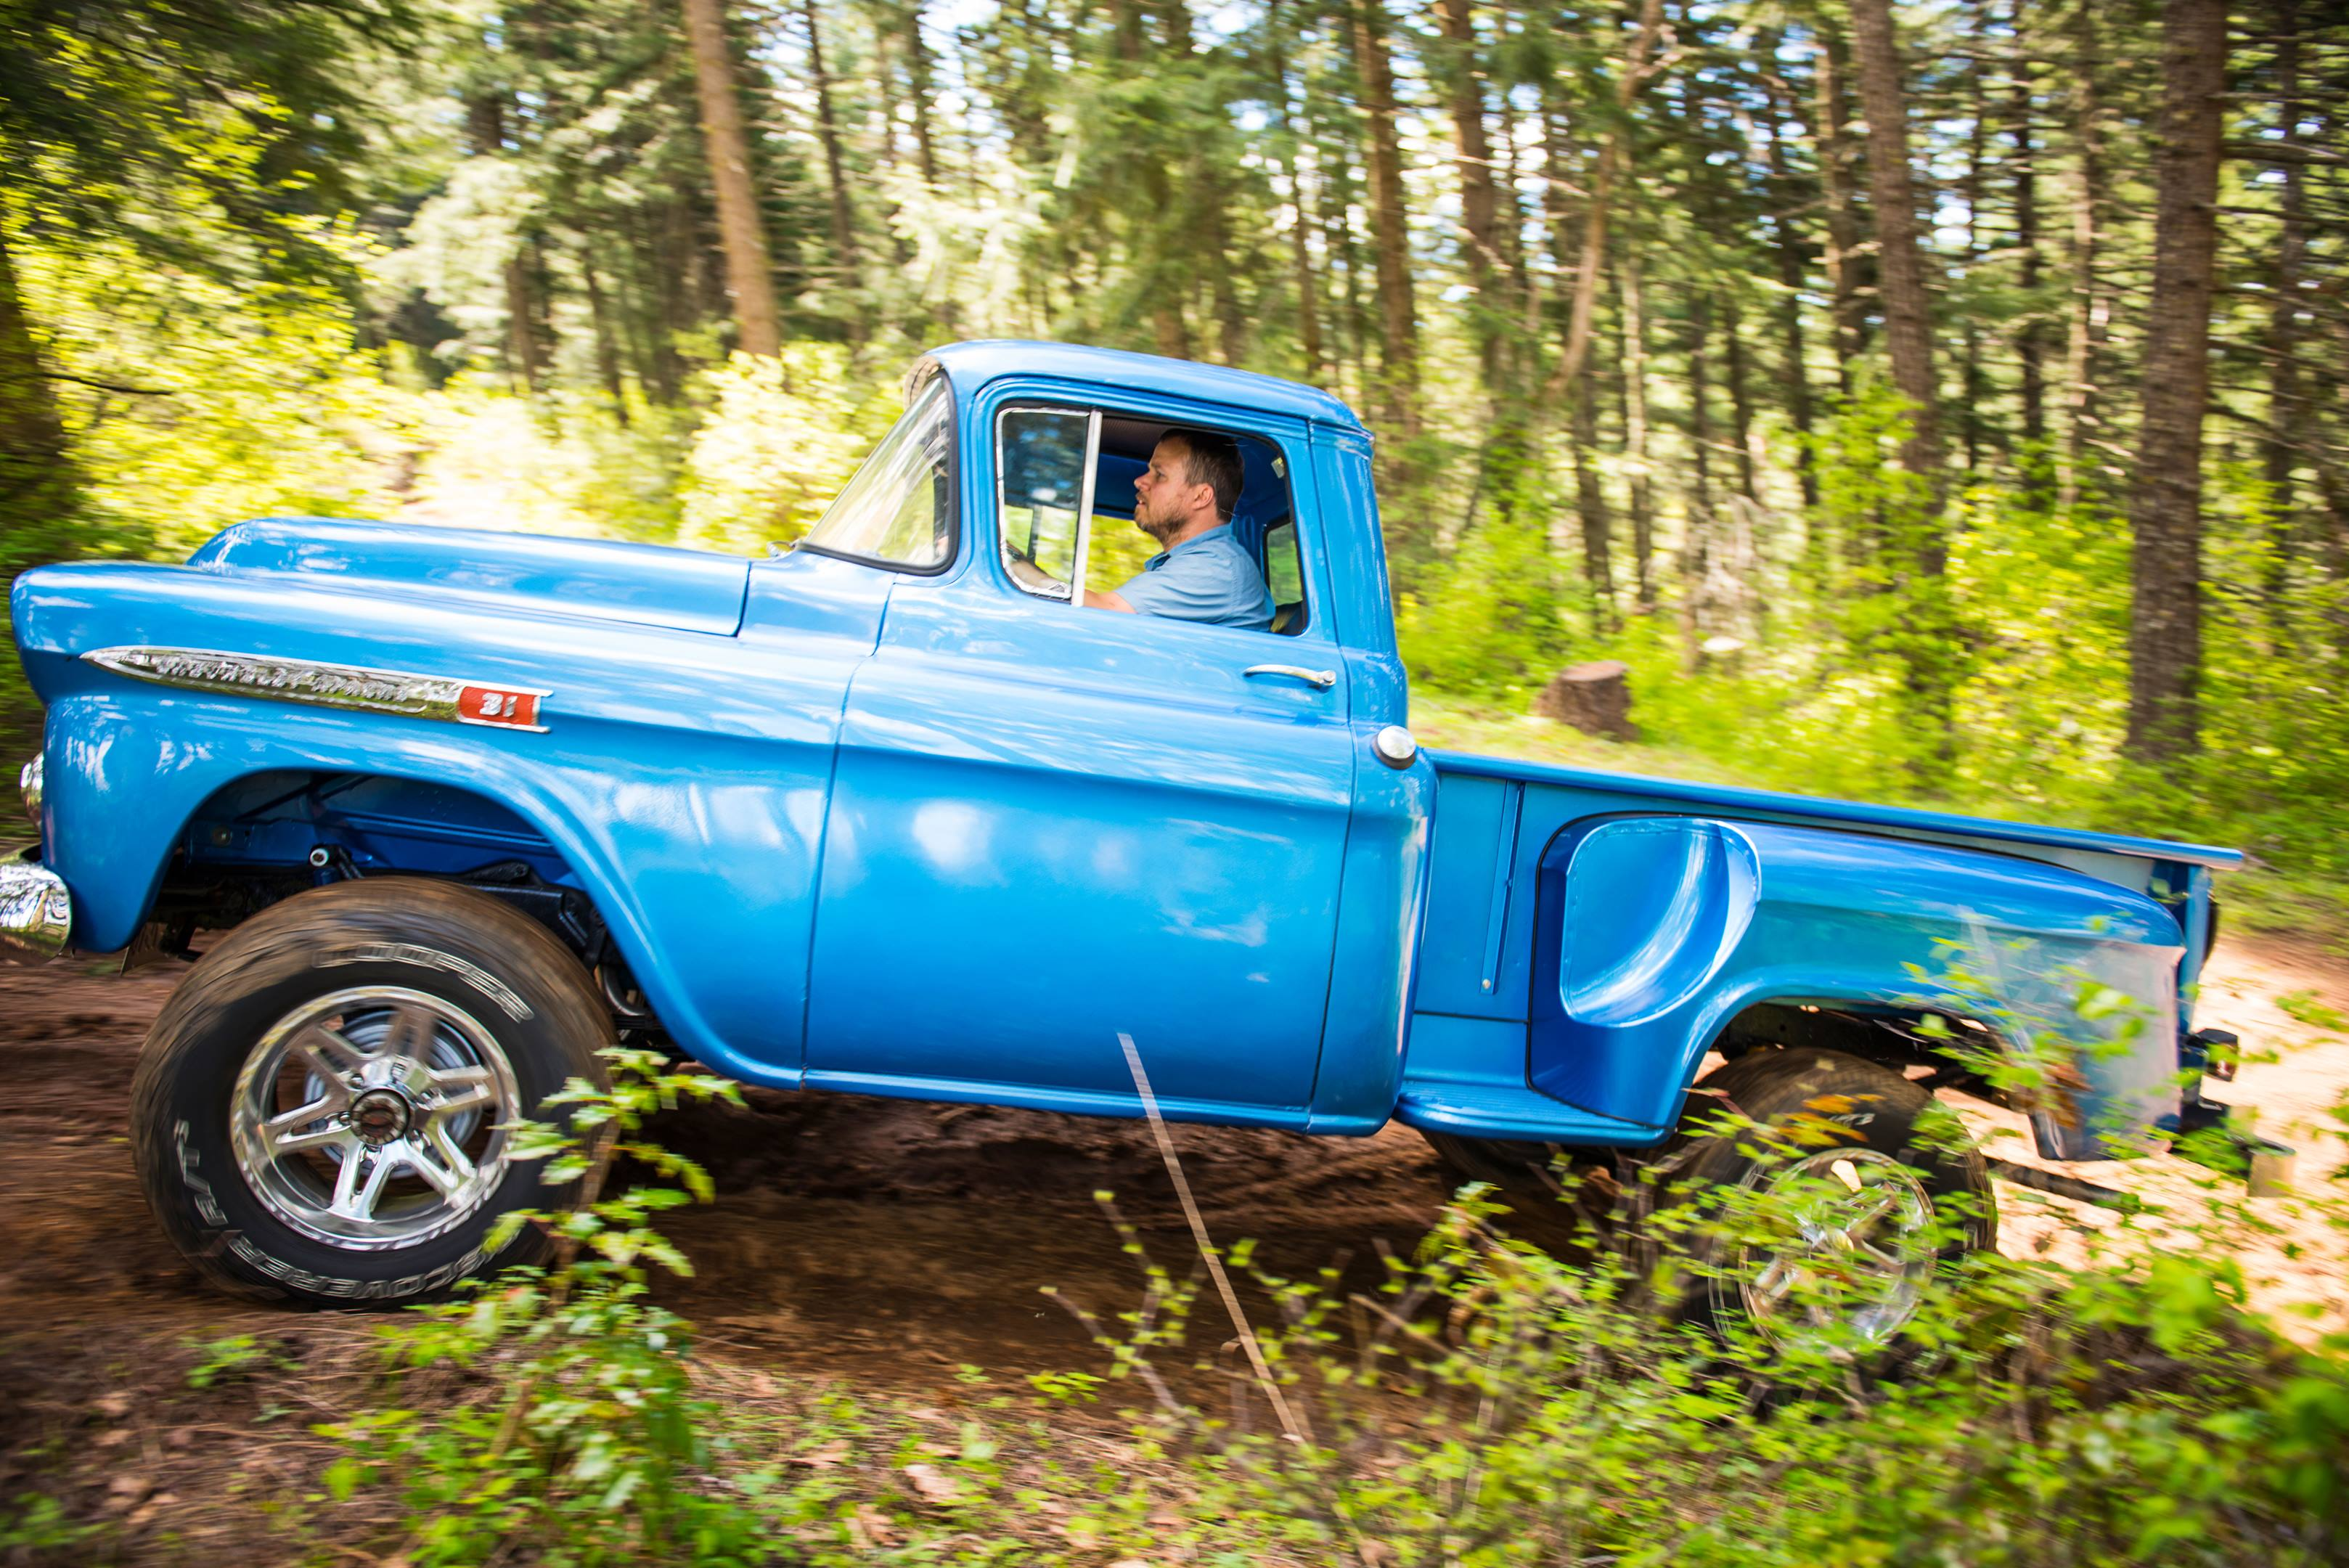 Chevy 4x4 truck profile